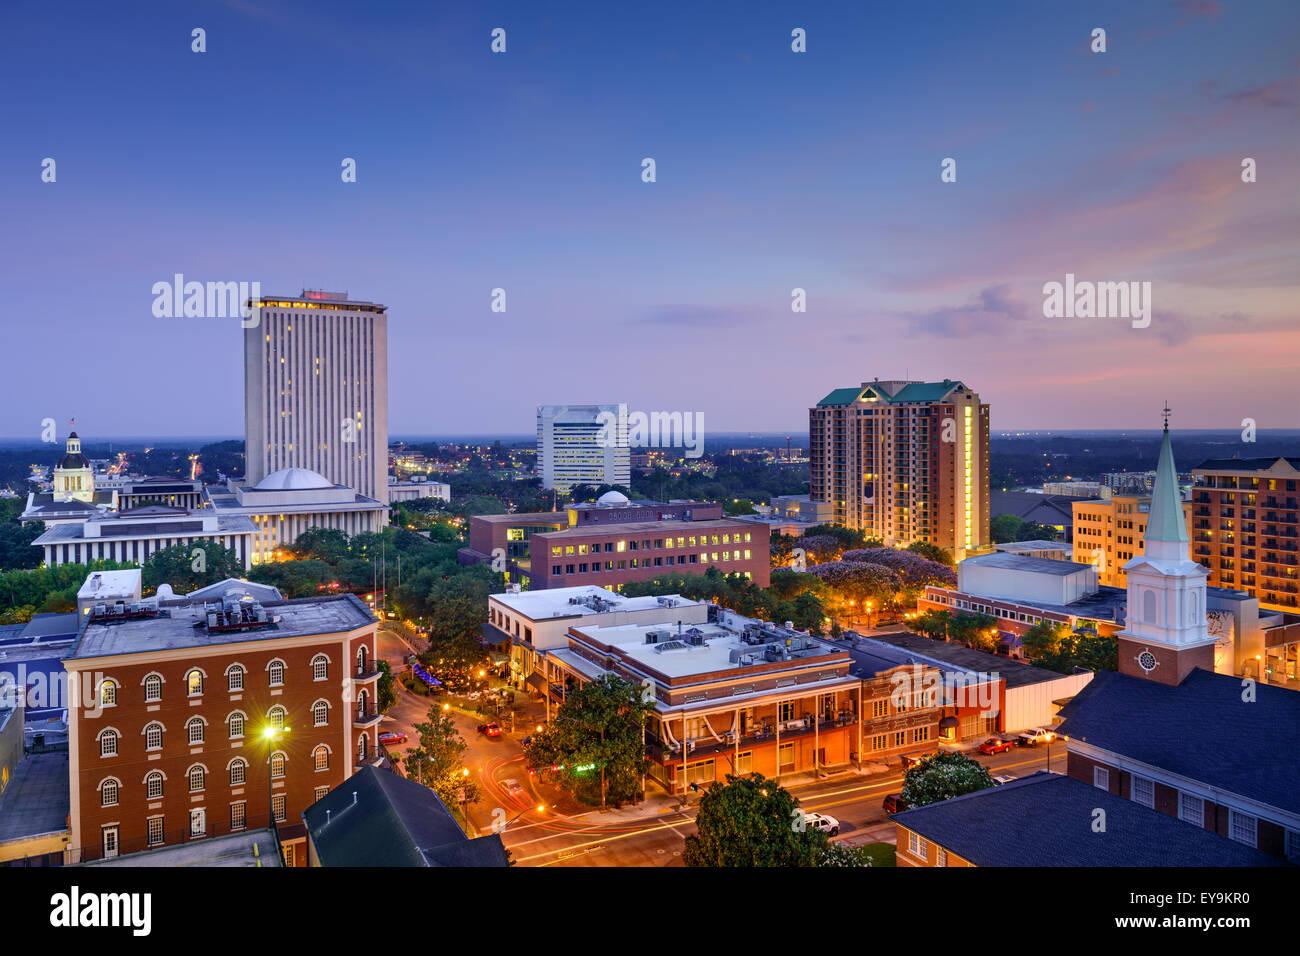 Tallahassee, Florida, USA Skyline der Innenstadt. Stockbild